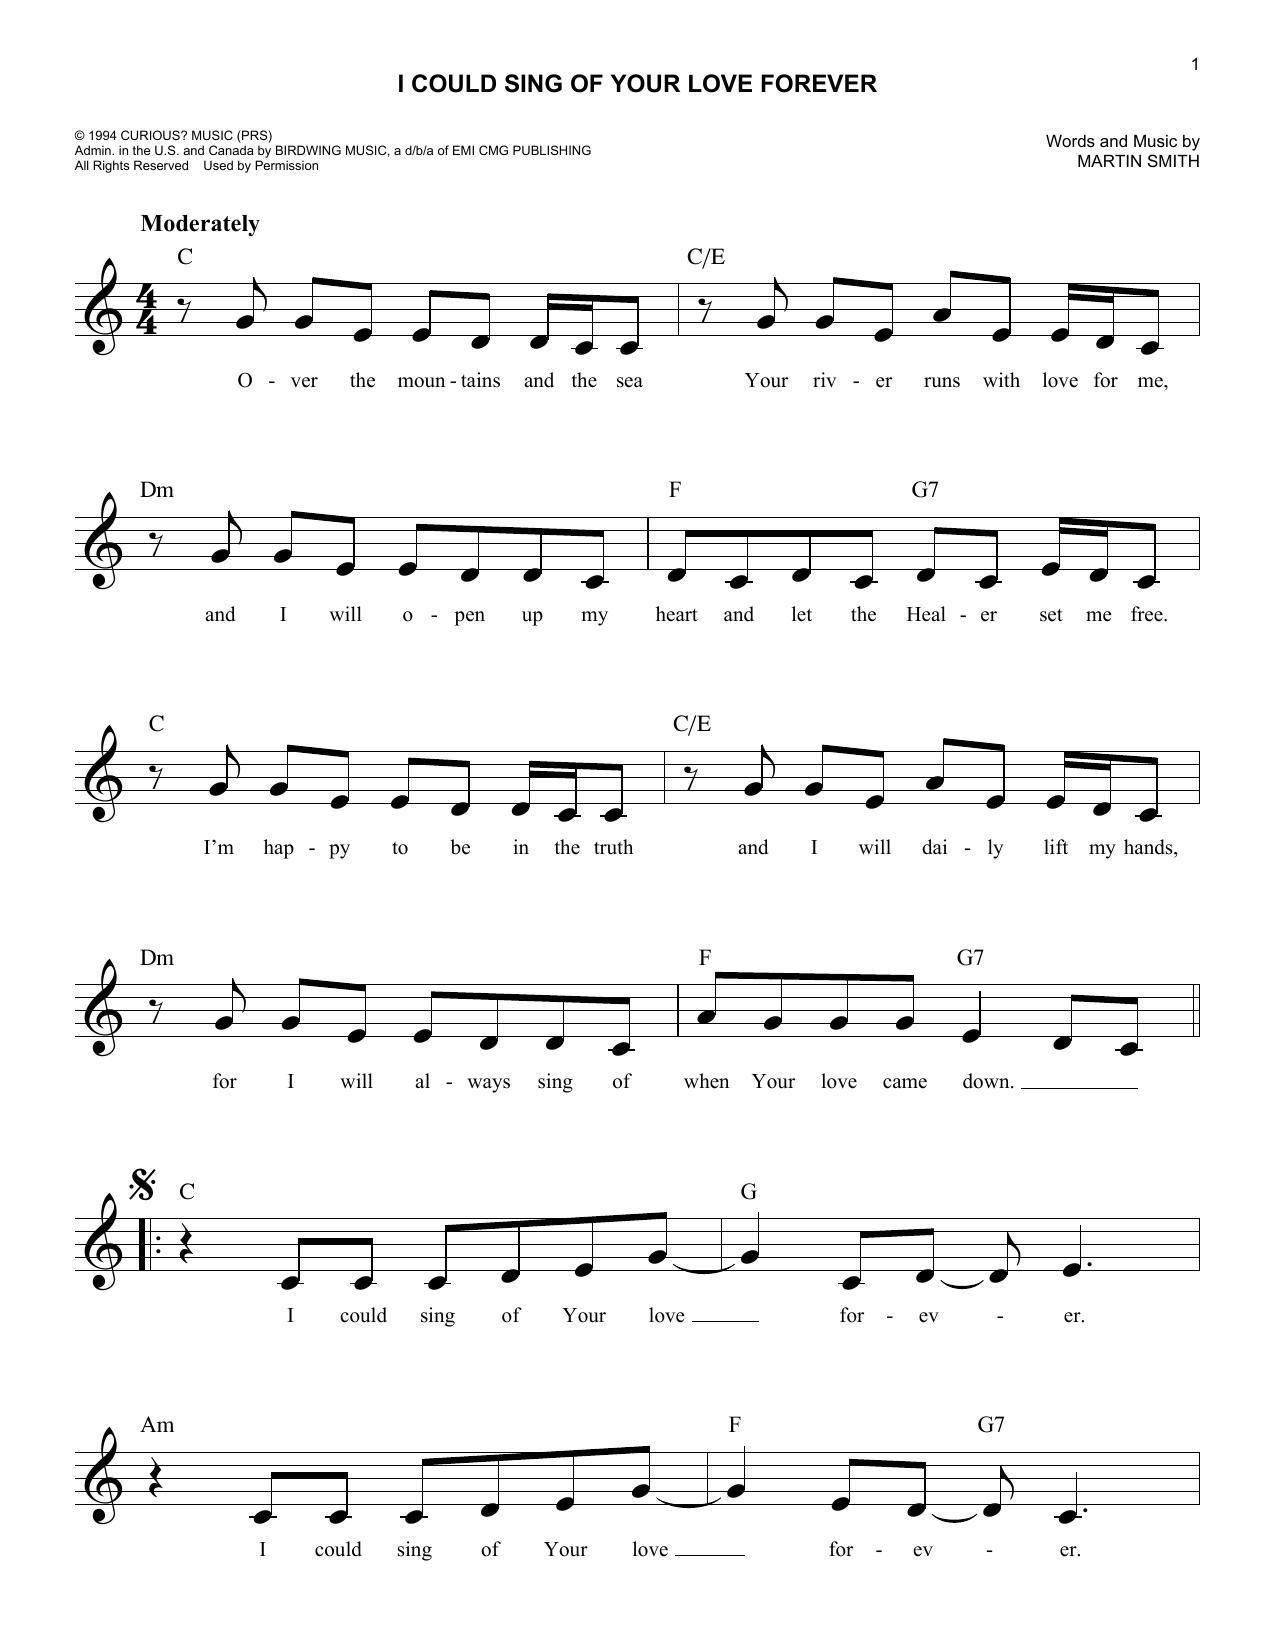 Sheet Music Digital Files To Print Licensed Delirious Digital